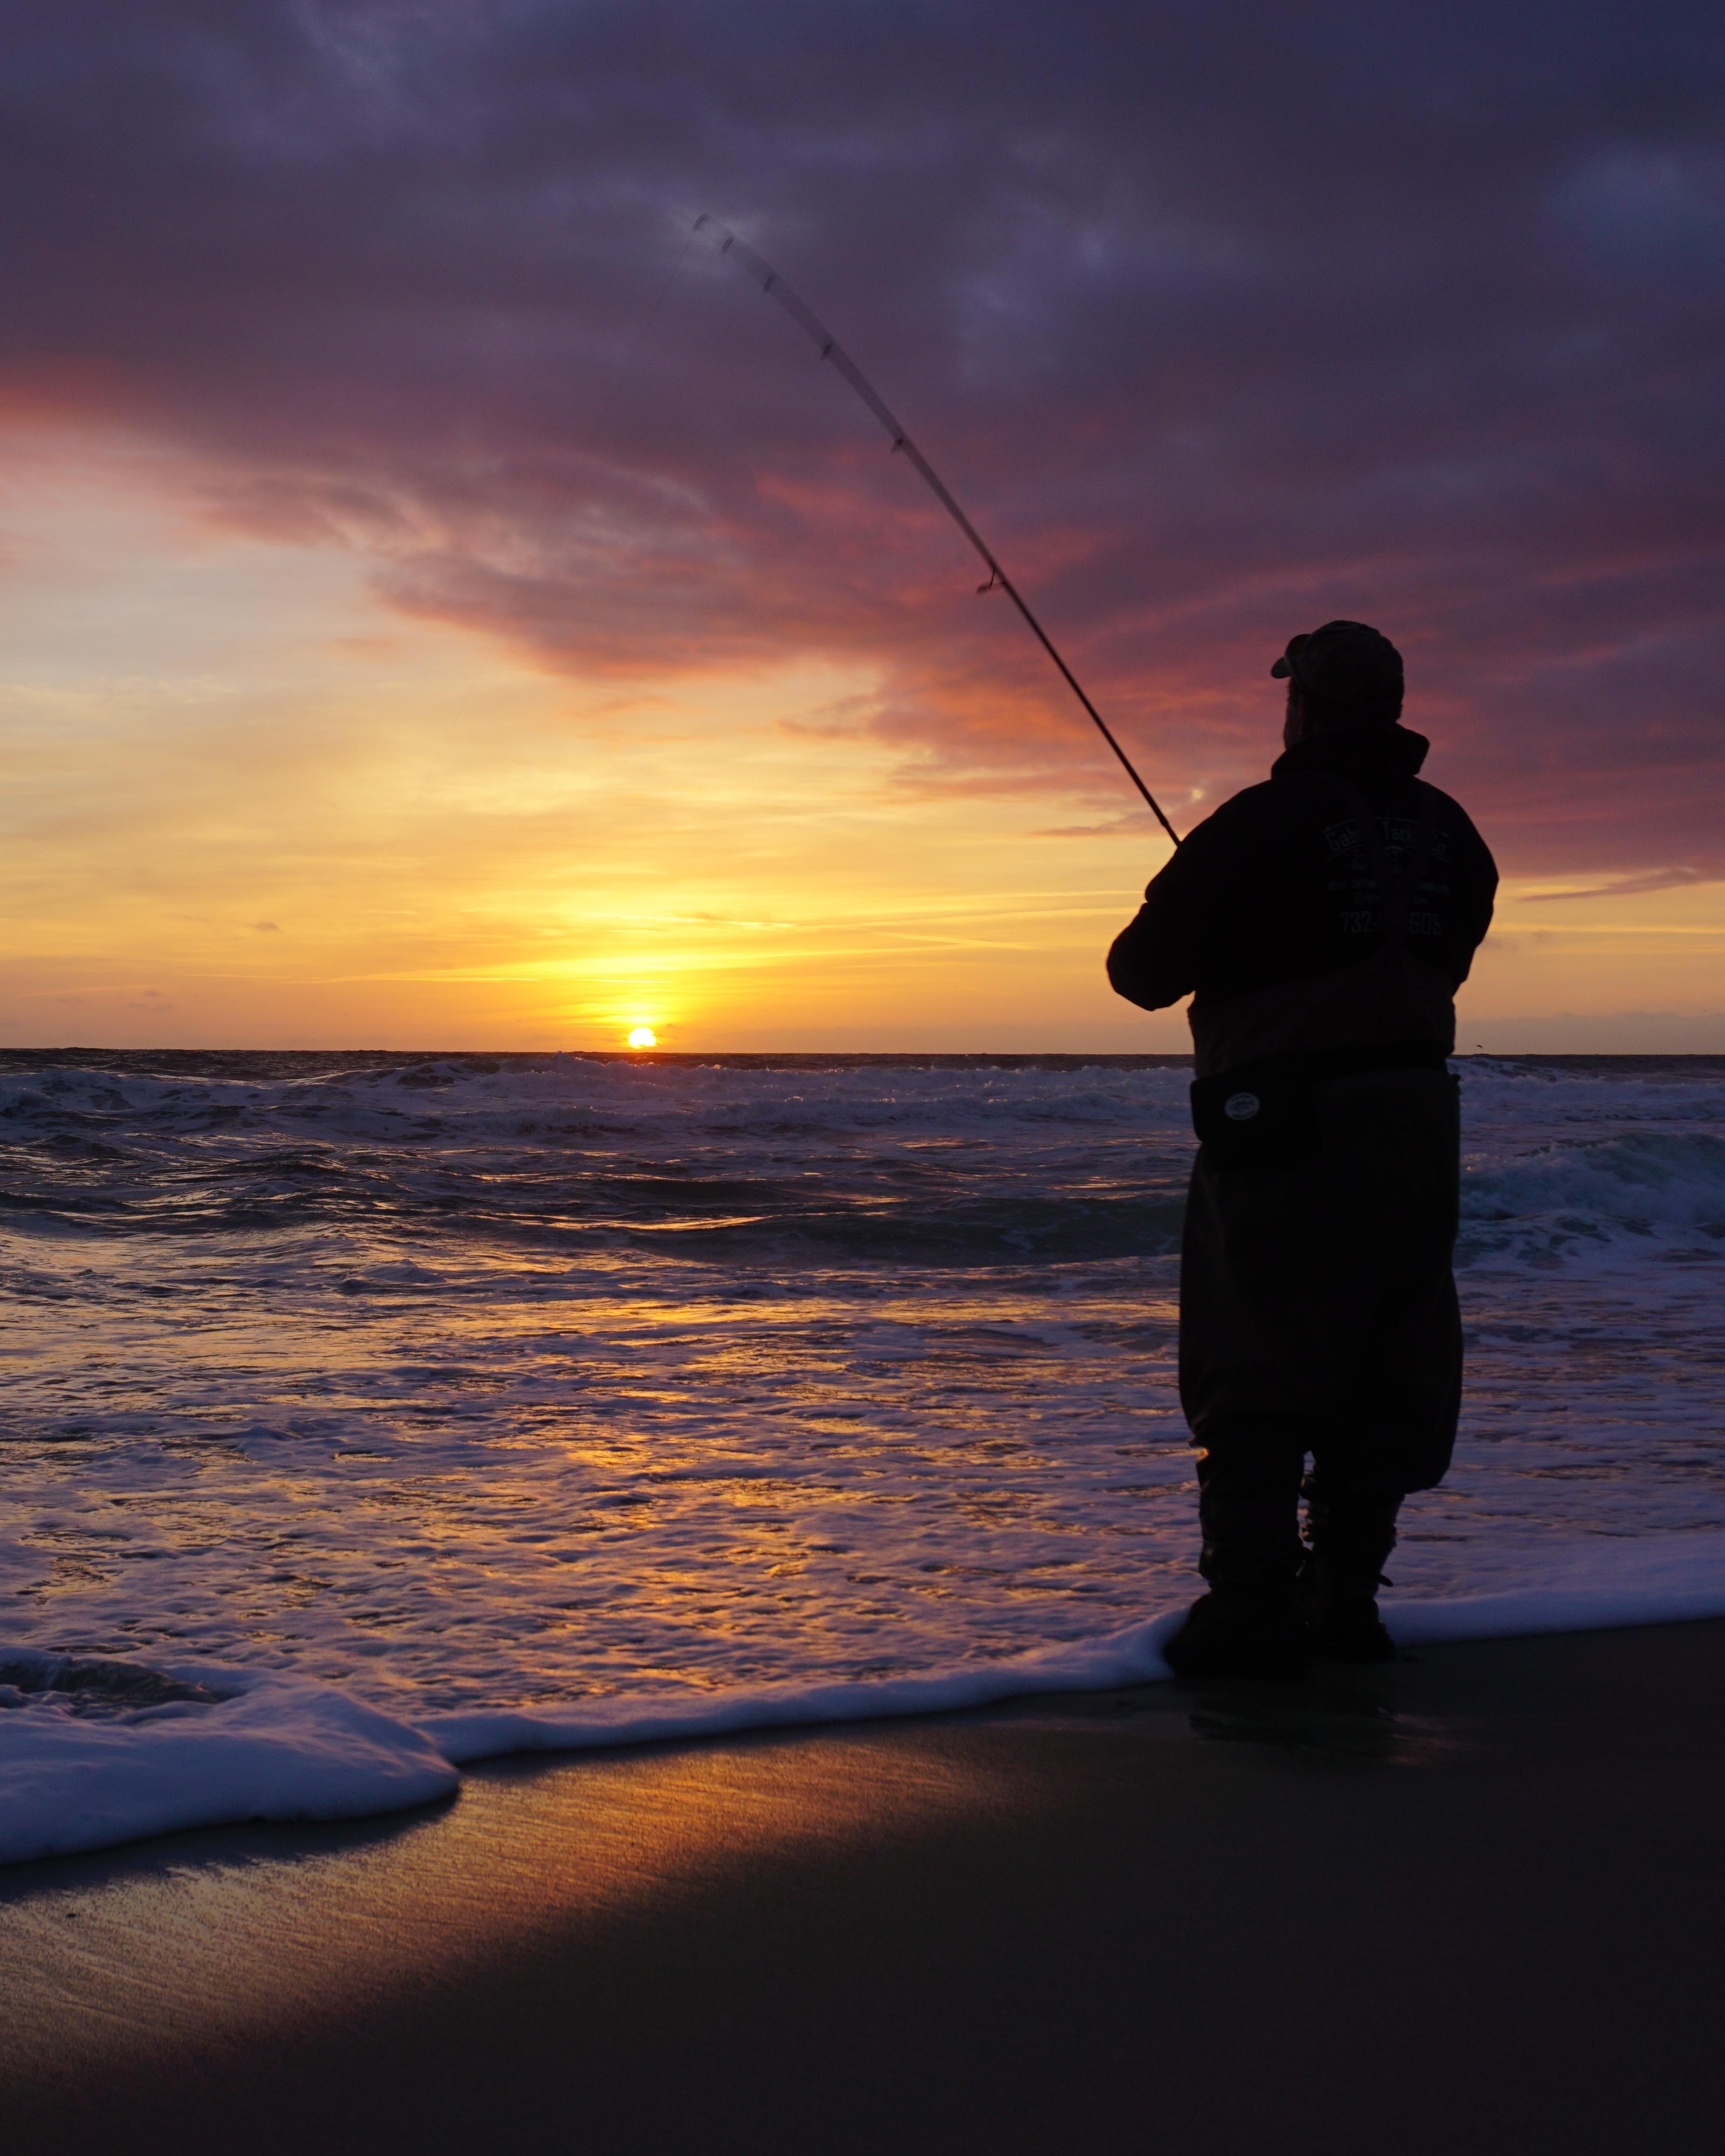 silhouette fishing